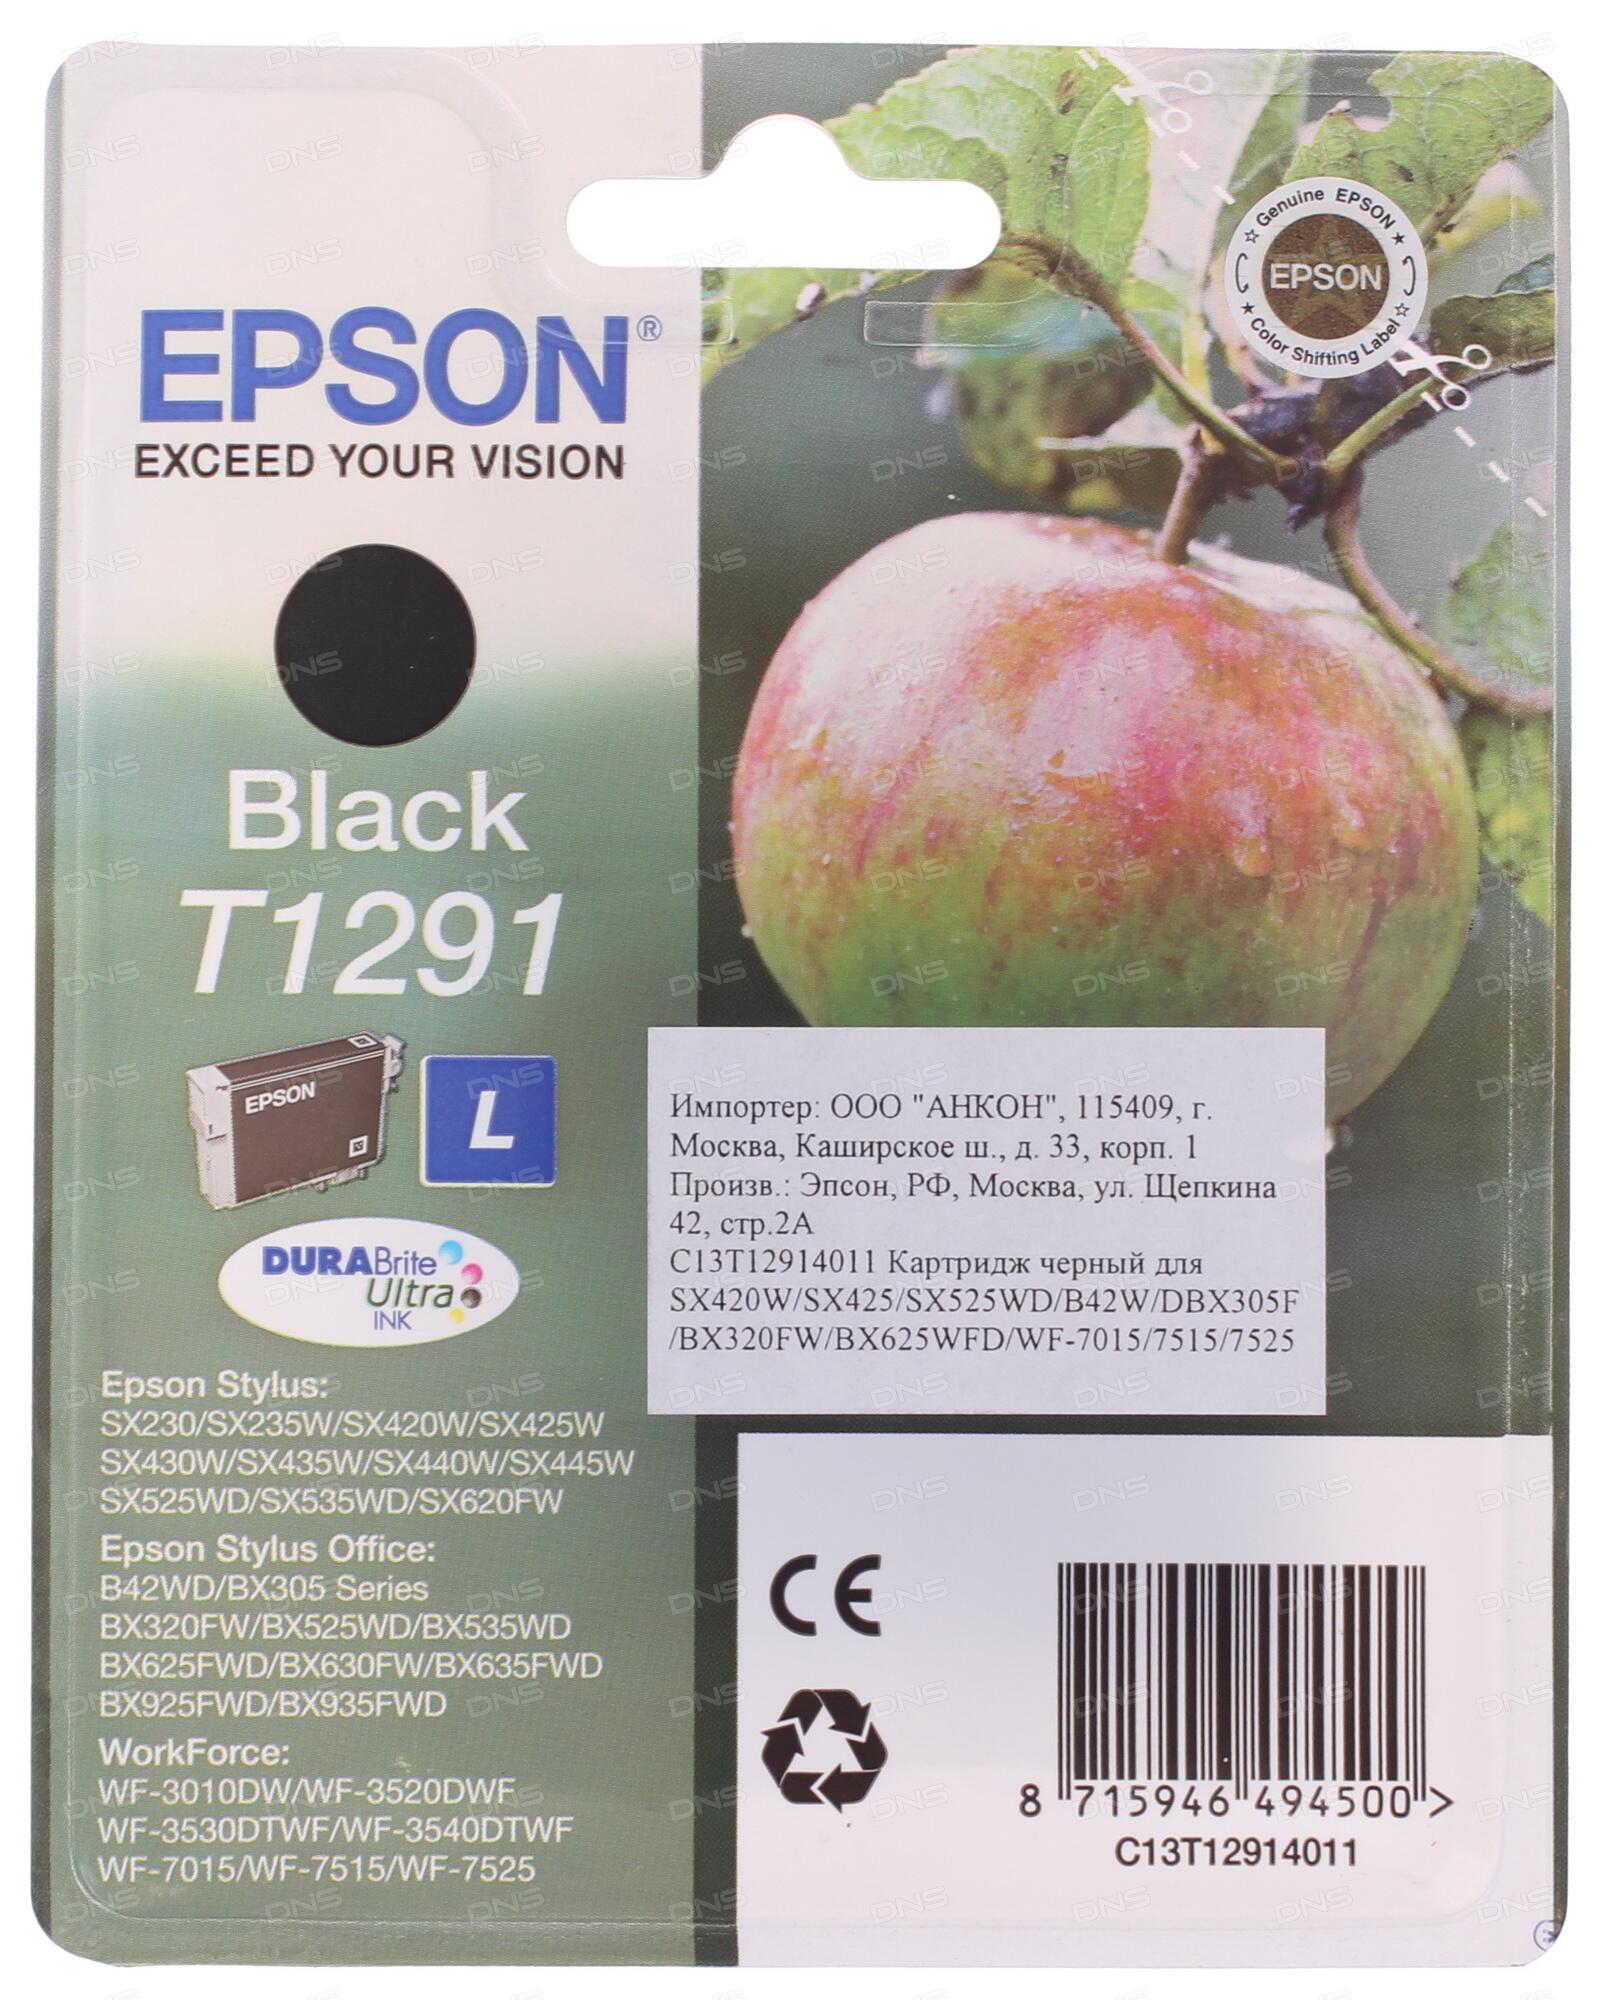 epson t1291 l c13t12914011. Black Bedroom Furniture Sets. Home Design Ideas